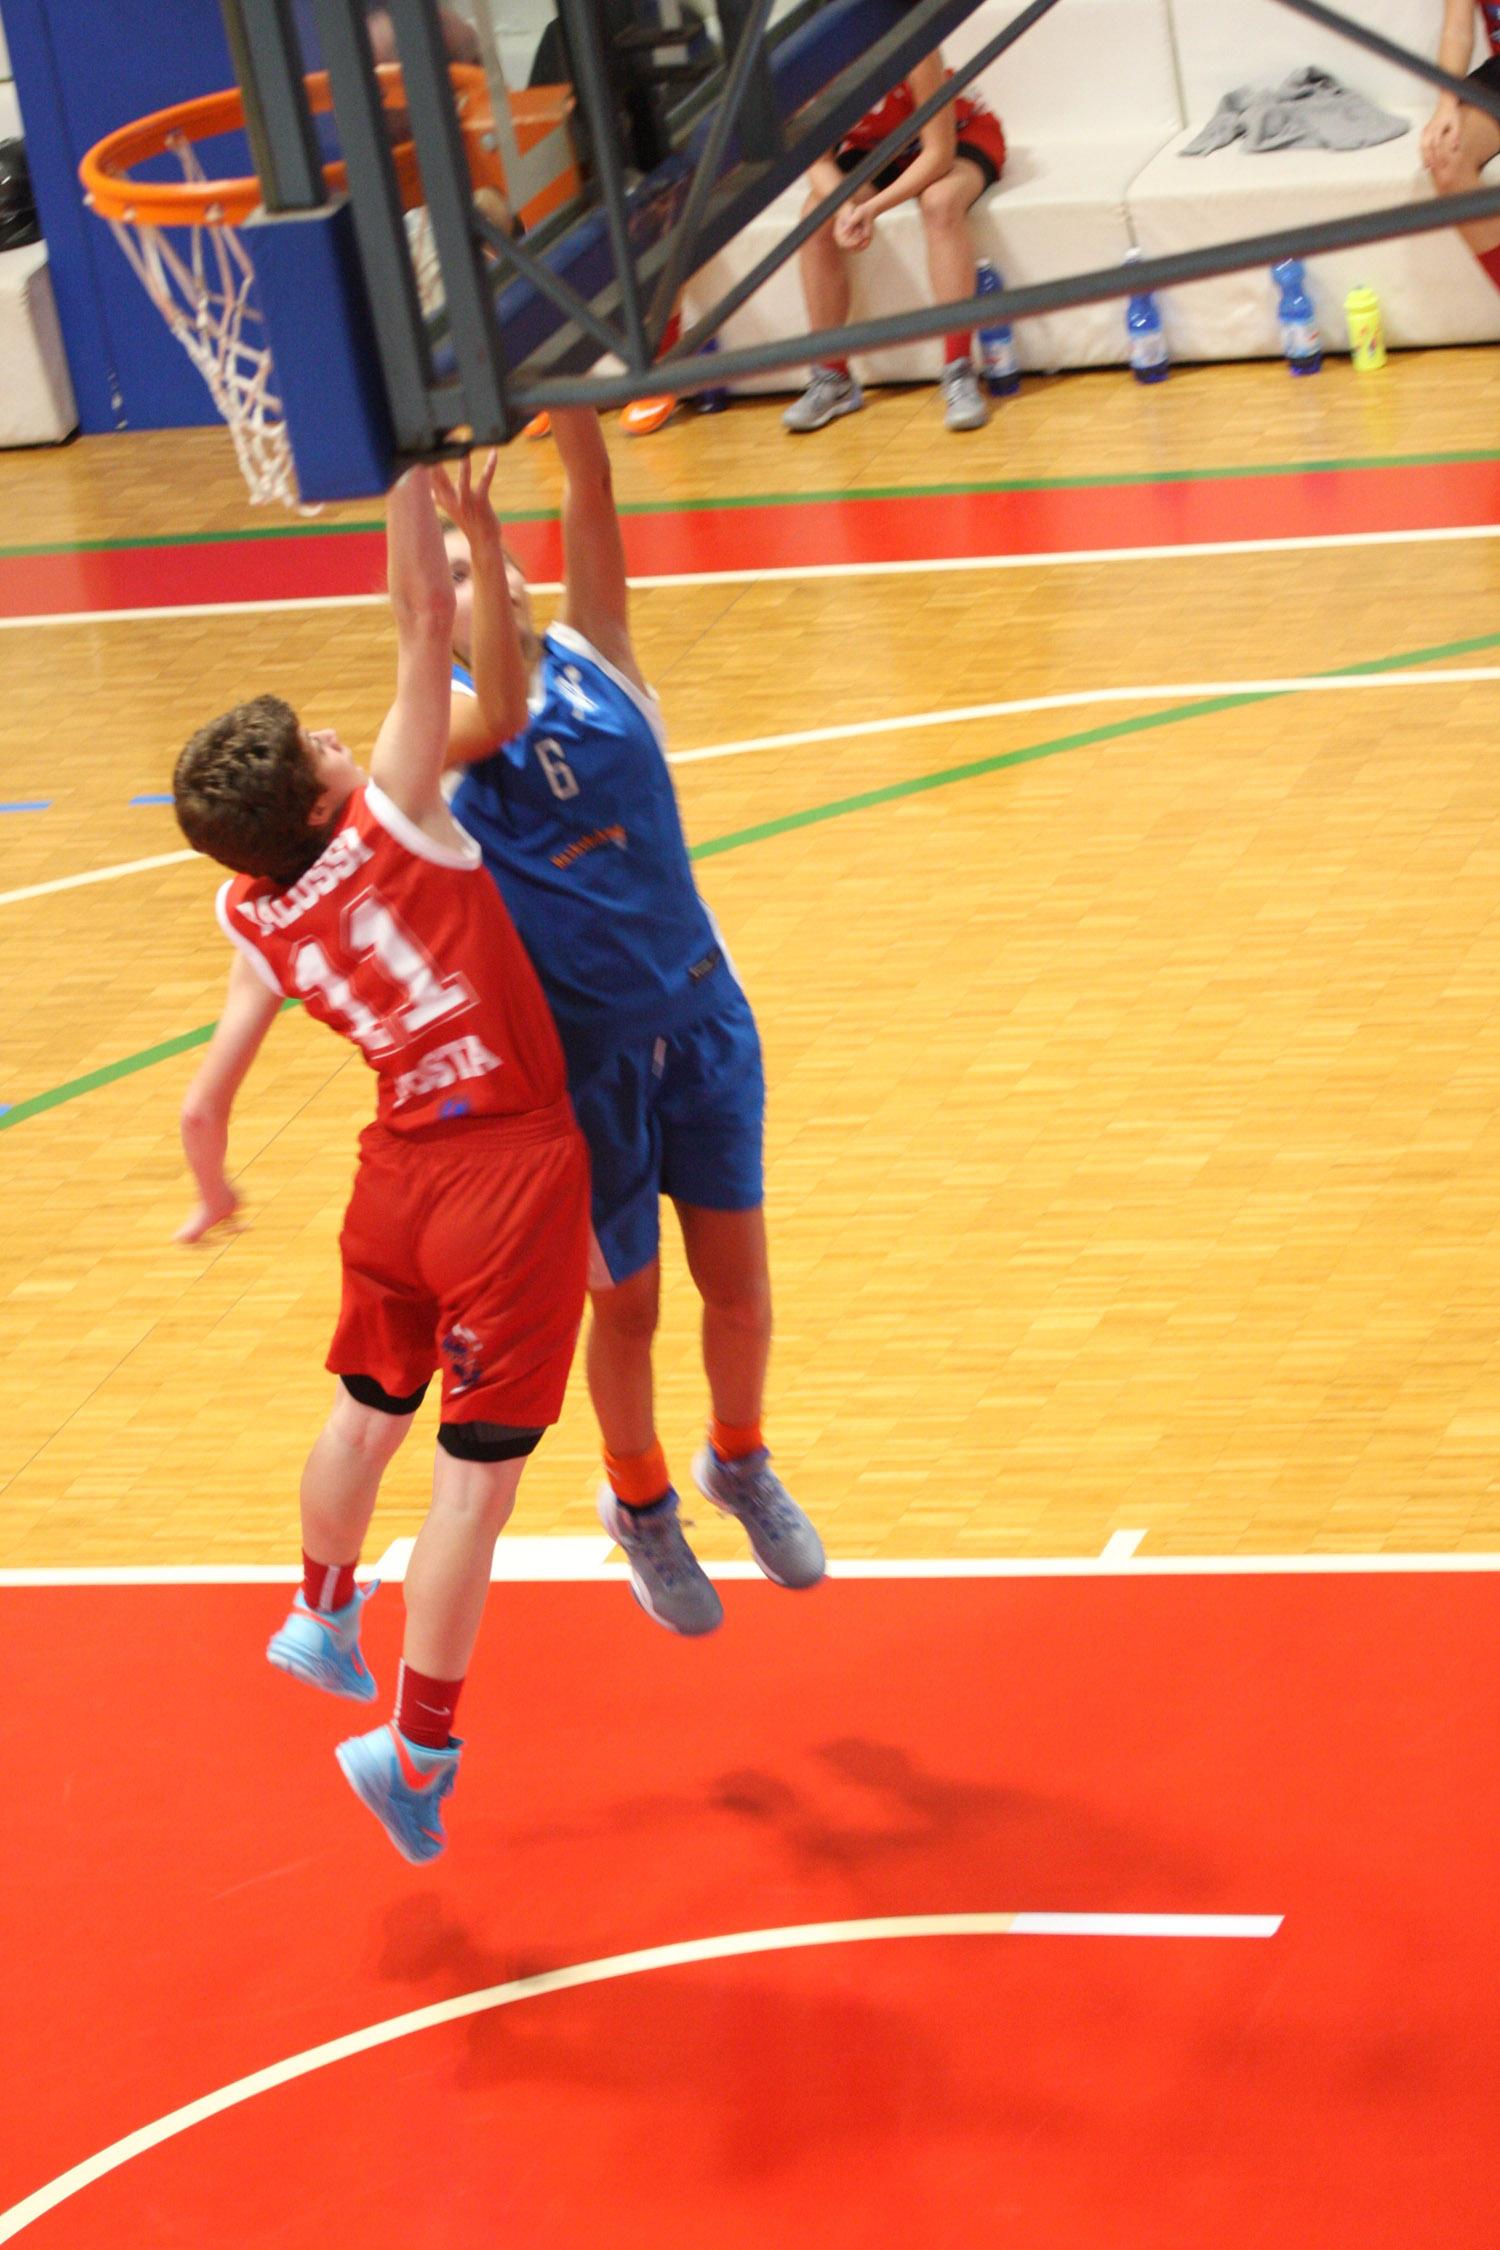 U16E - Costa Masnaga vs Baskettiamo Vittuone 2001 00041.jpg